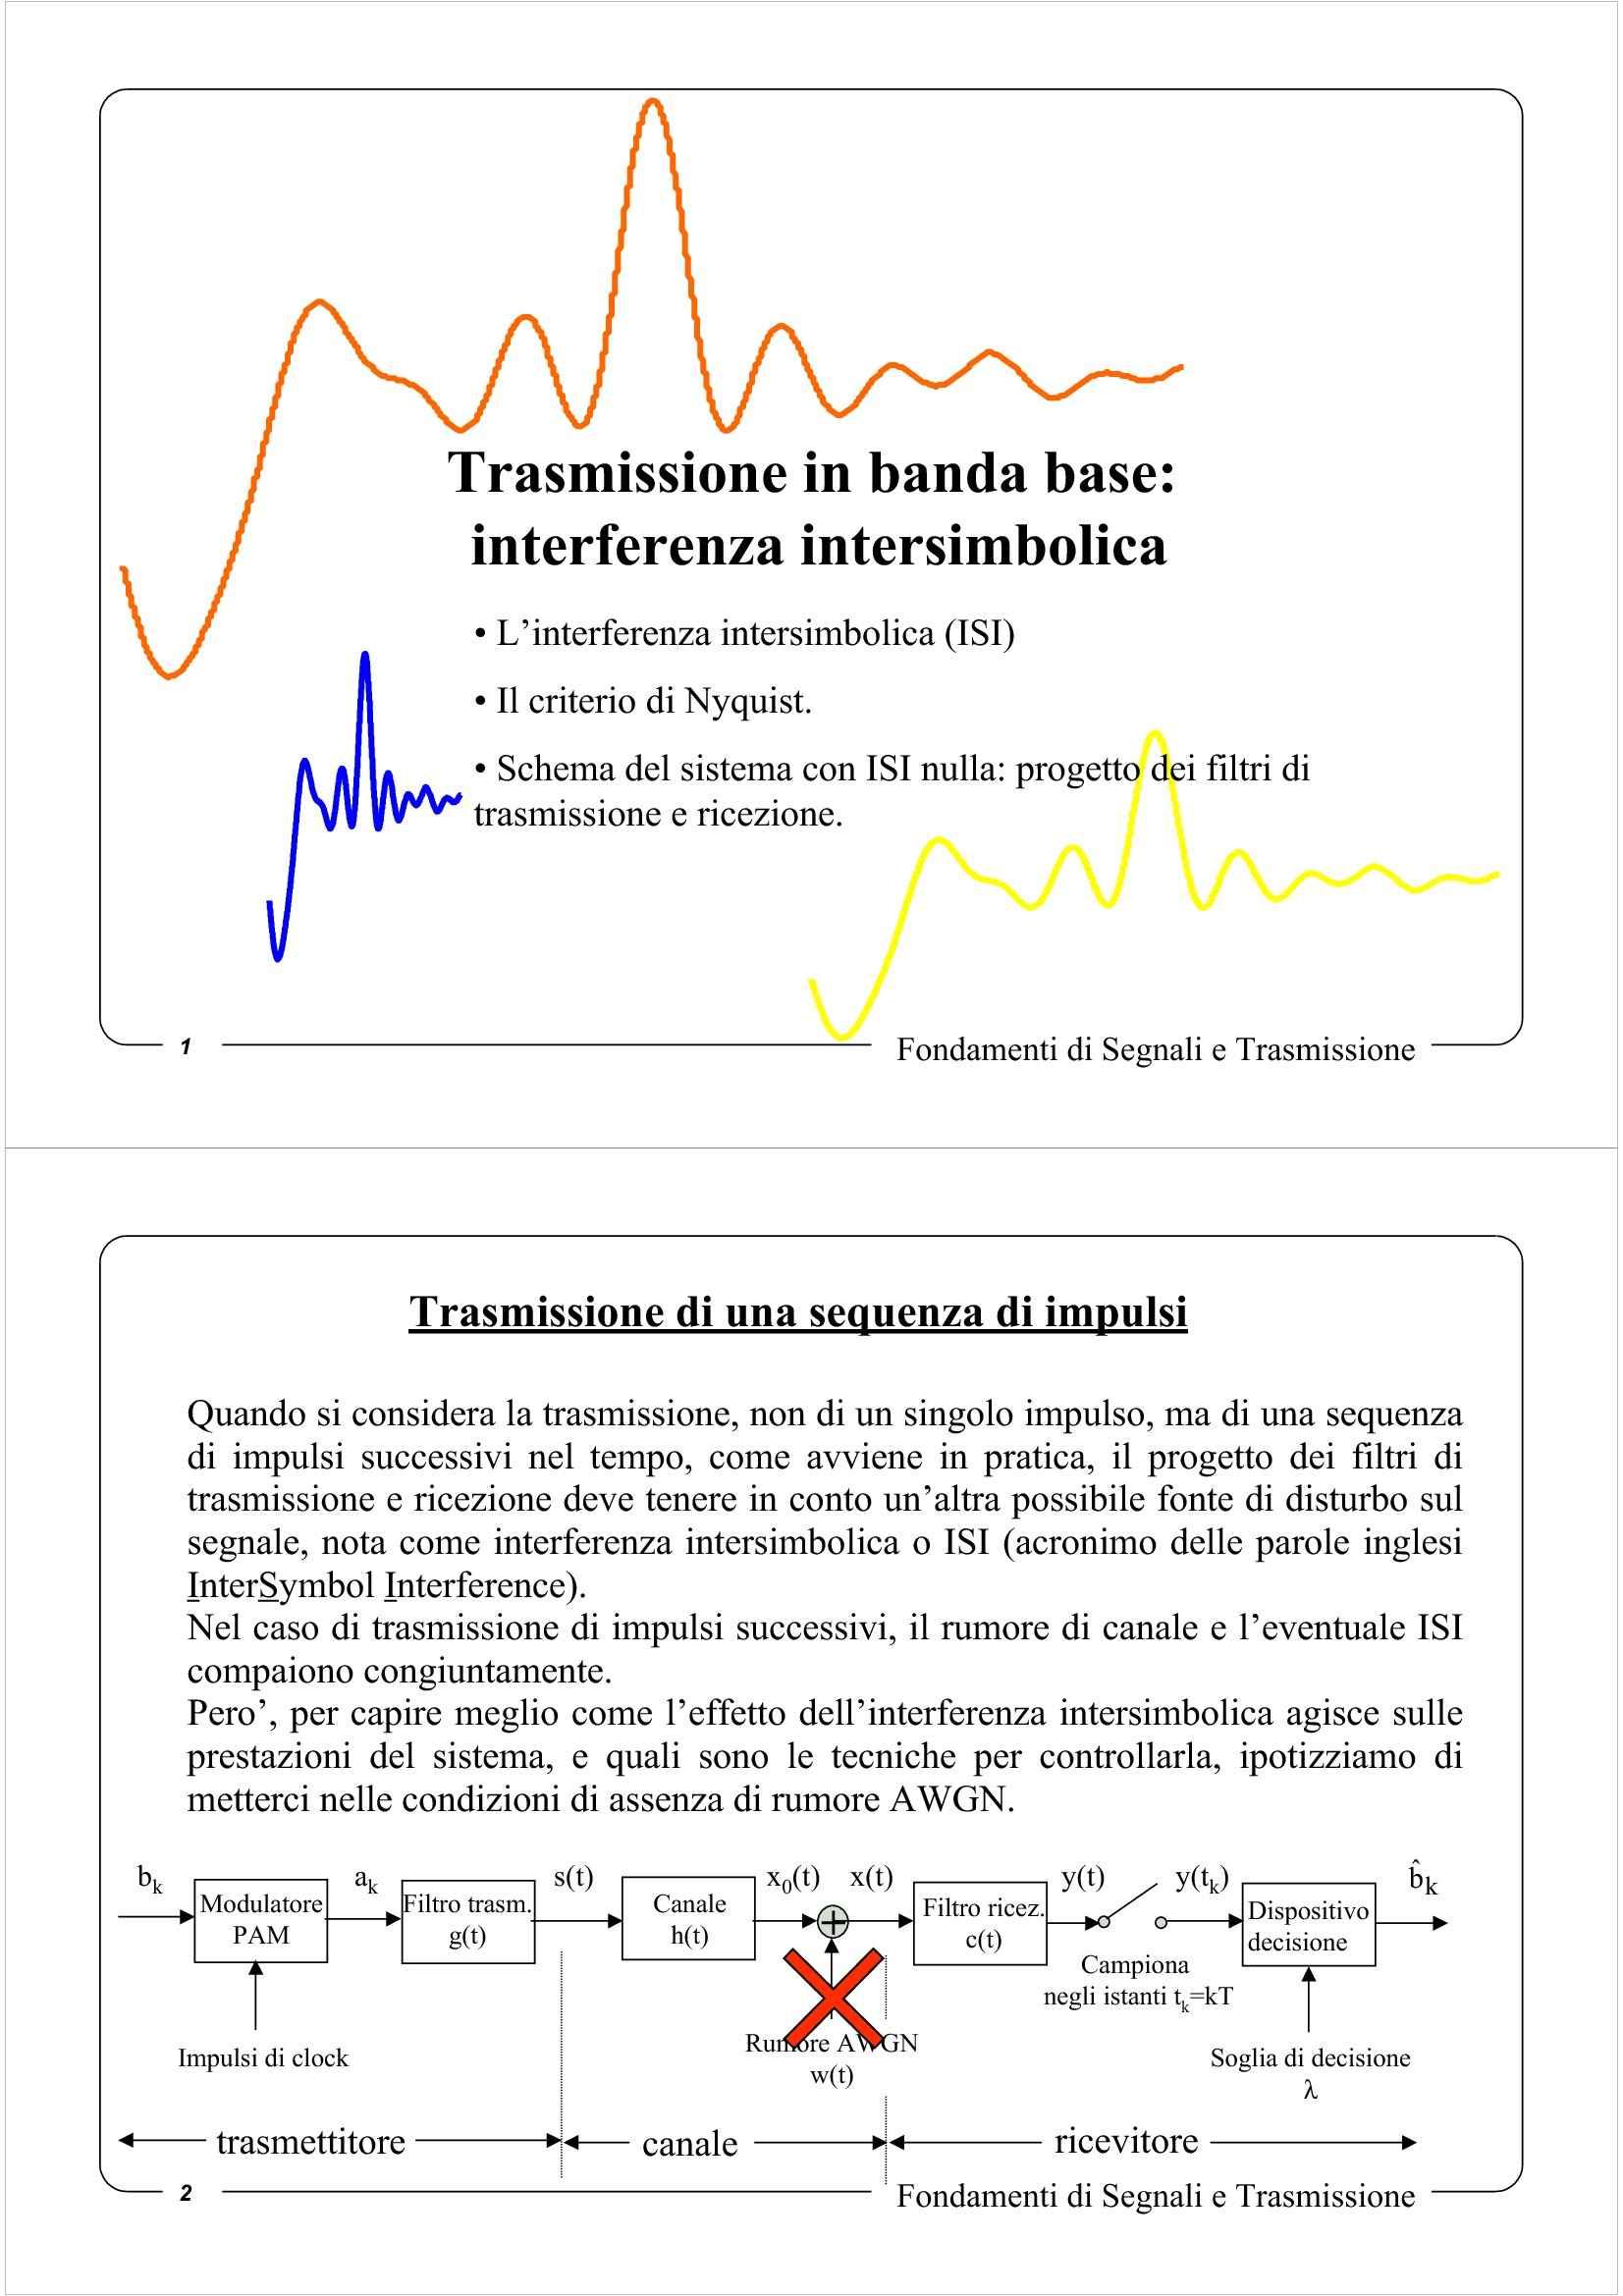 Trasmissione in banda base - Interferenza intersimbolica